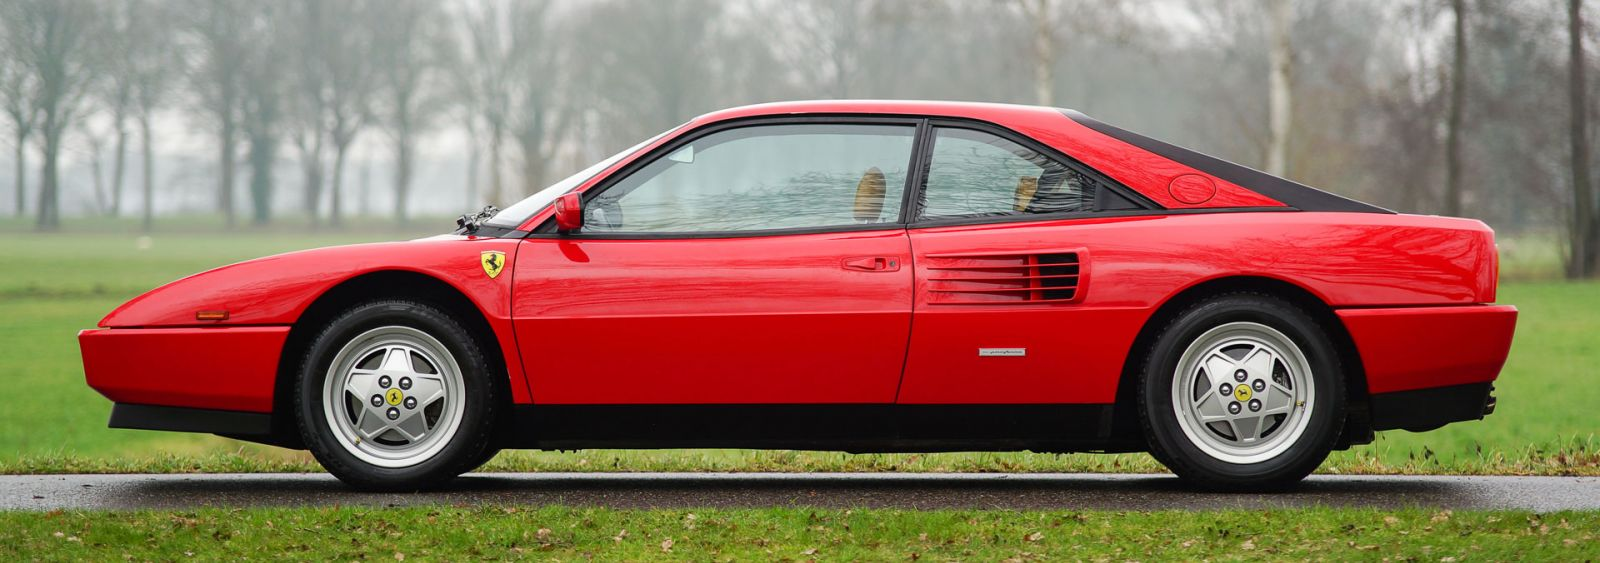 Ferrari Mondial T 1991 Classicargarage De